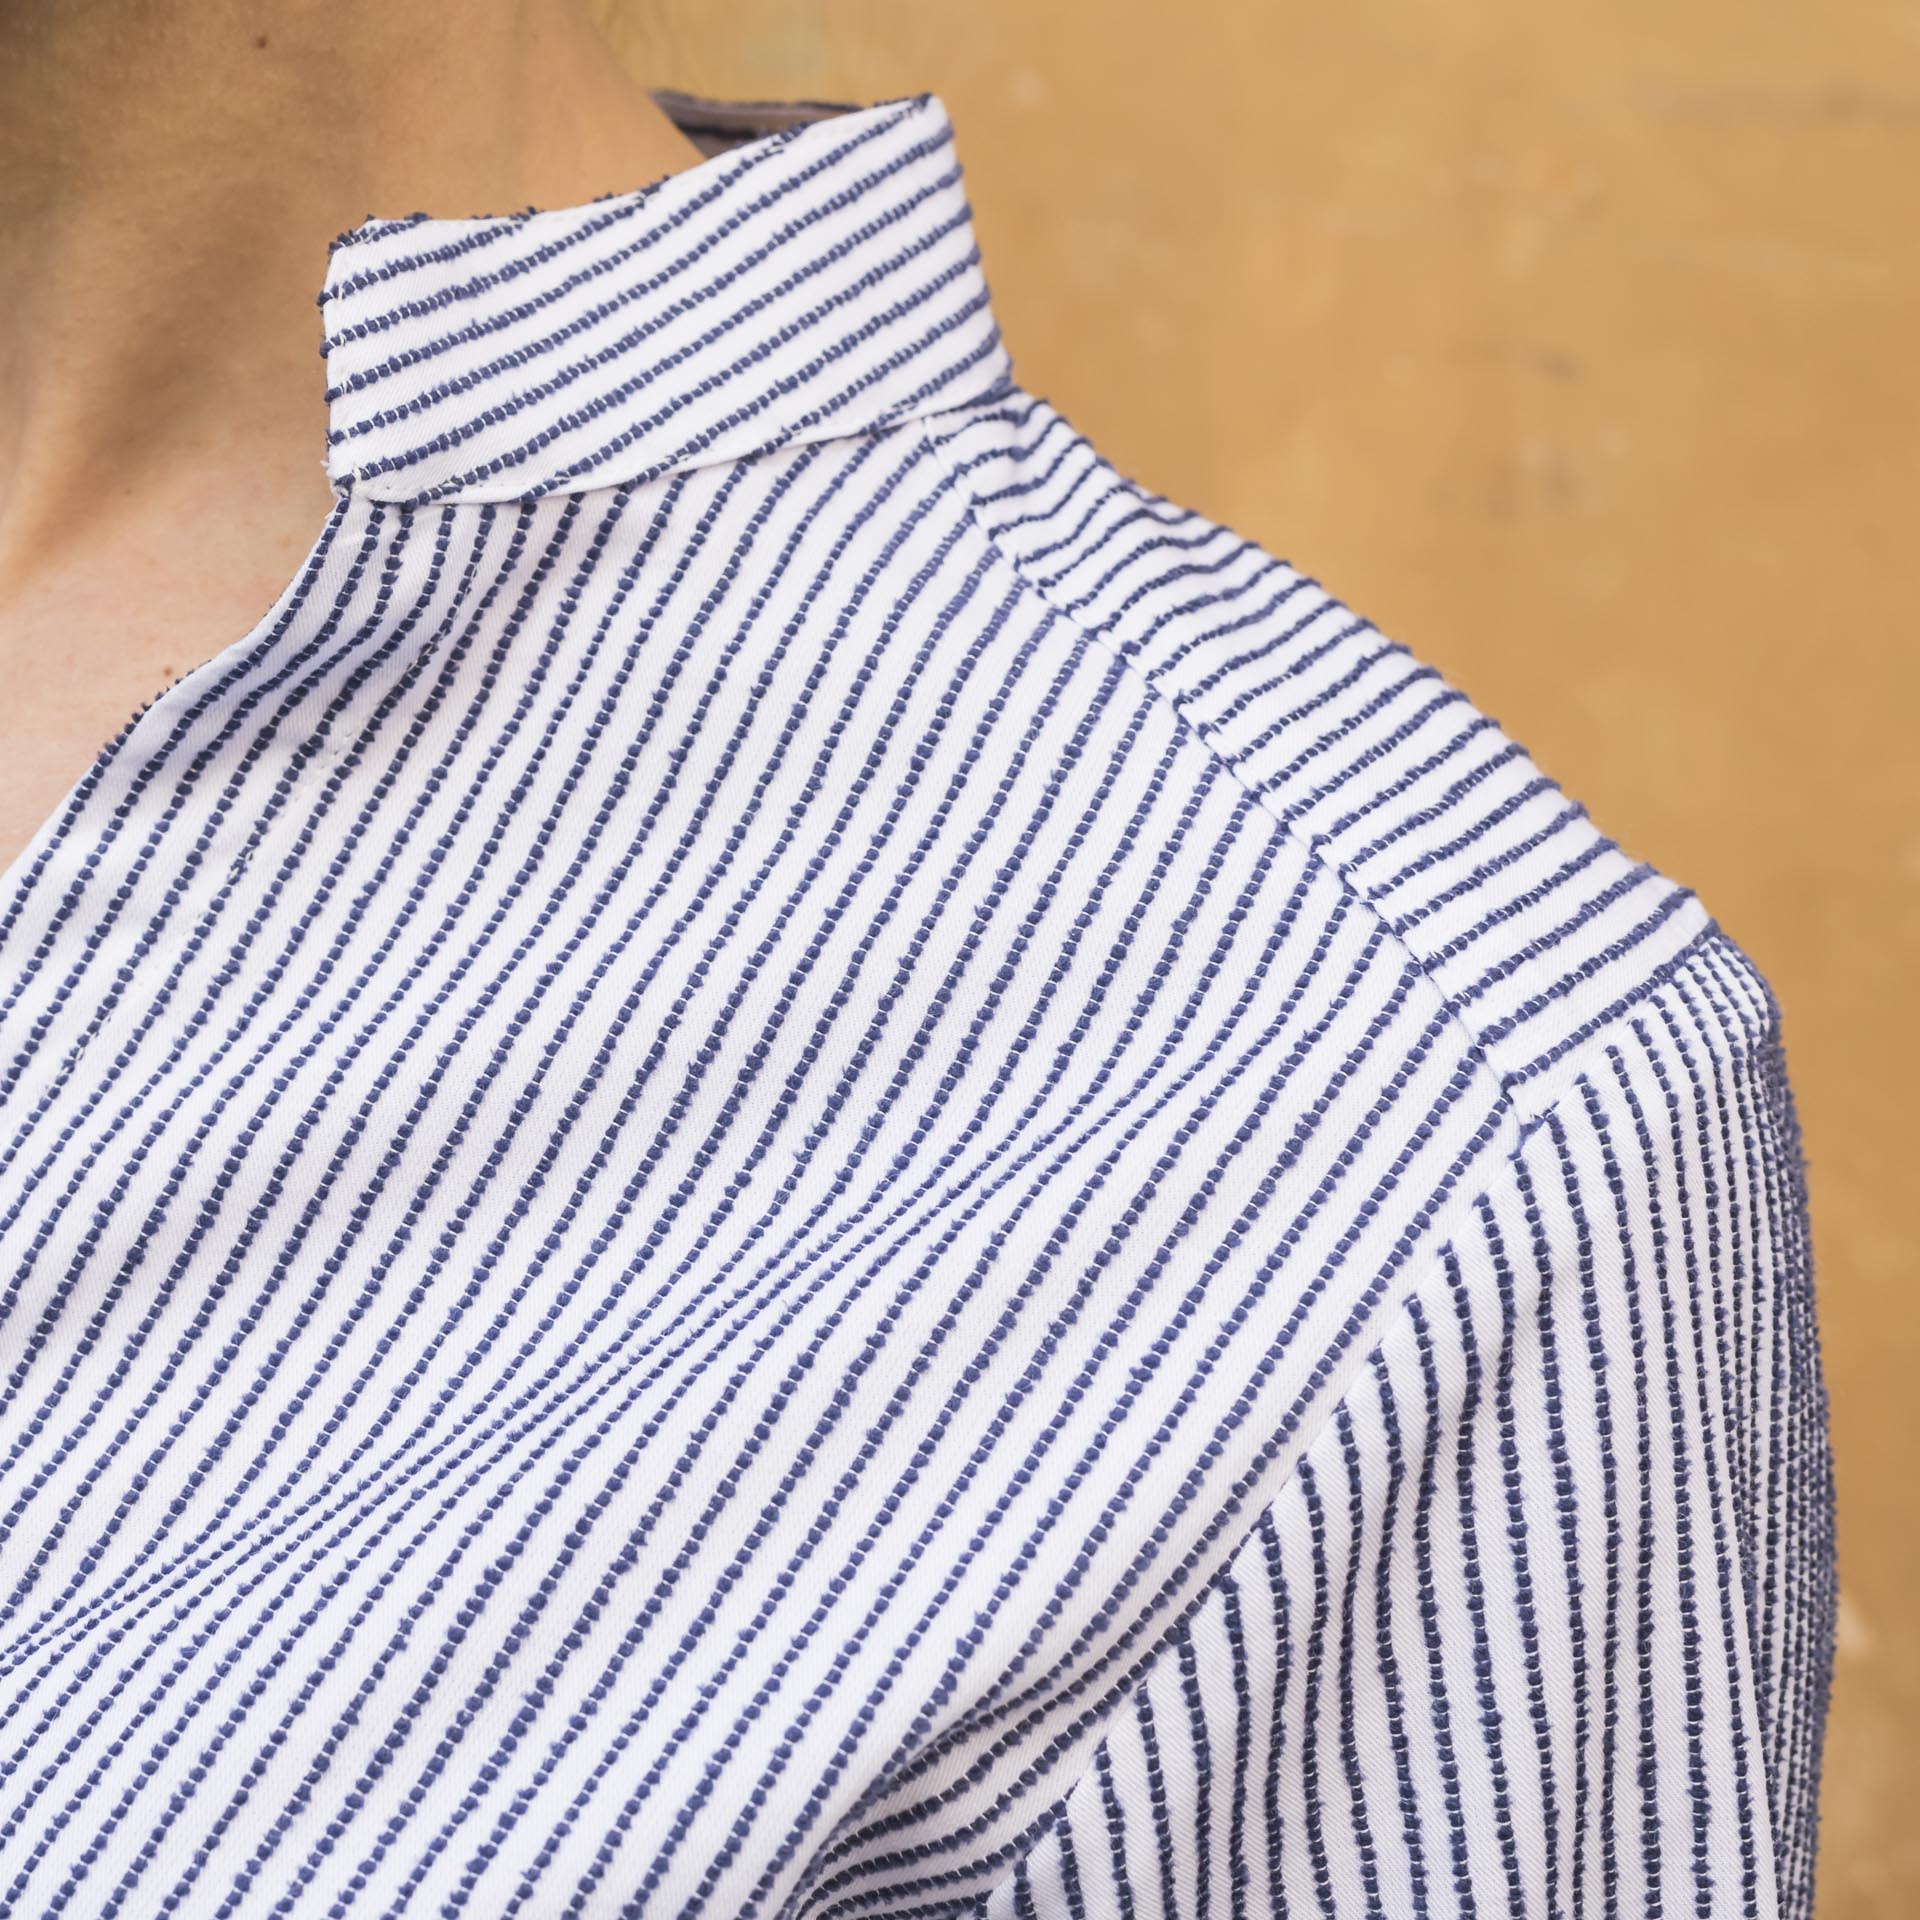 Hang On camicia slim fit twill cotone righe (2)